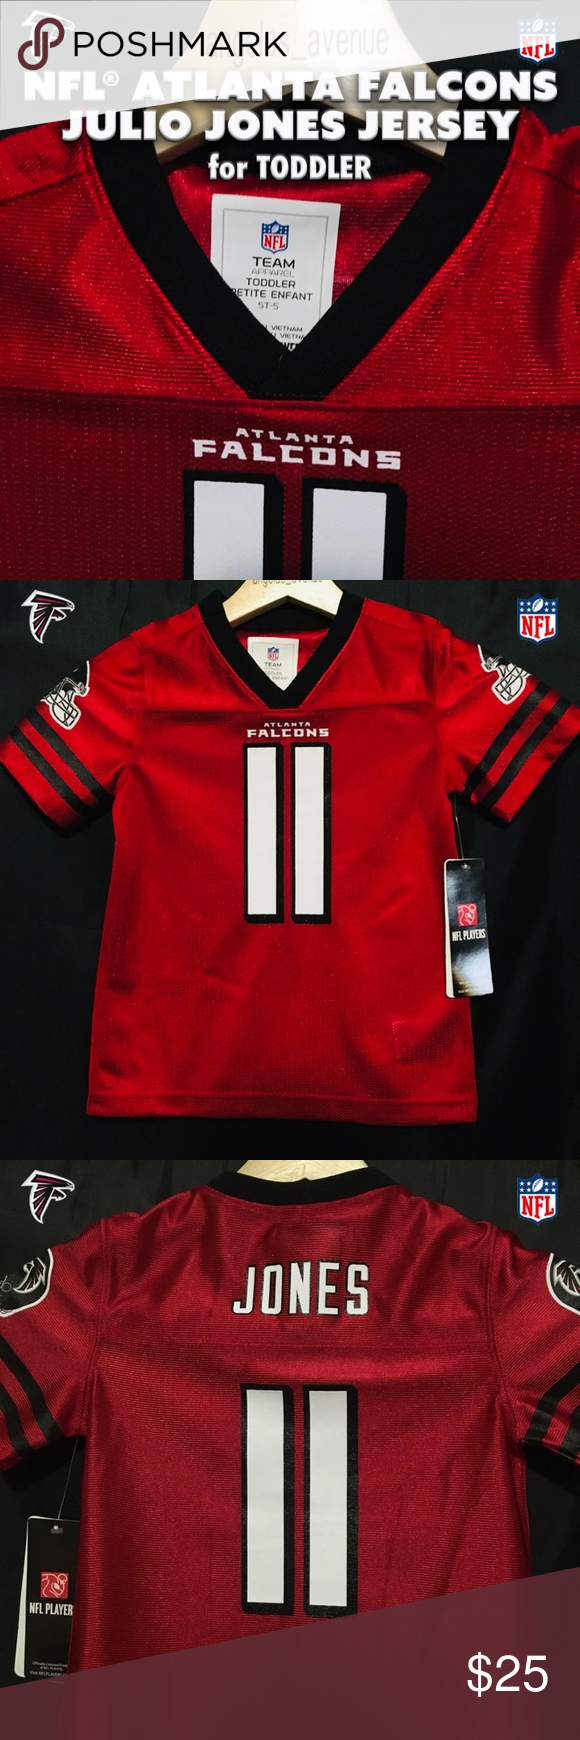 Nfl Atlanta Falcons Julio Jones Toddler Jersey In 2020 Toddler Jerseys Clothes Design Kids Shirts